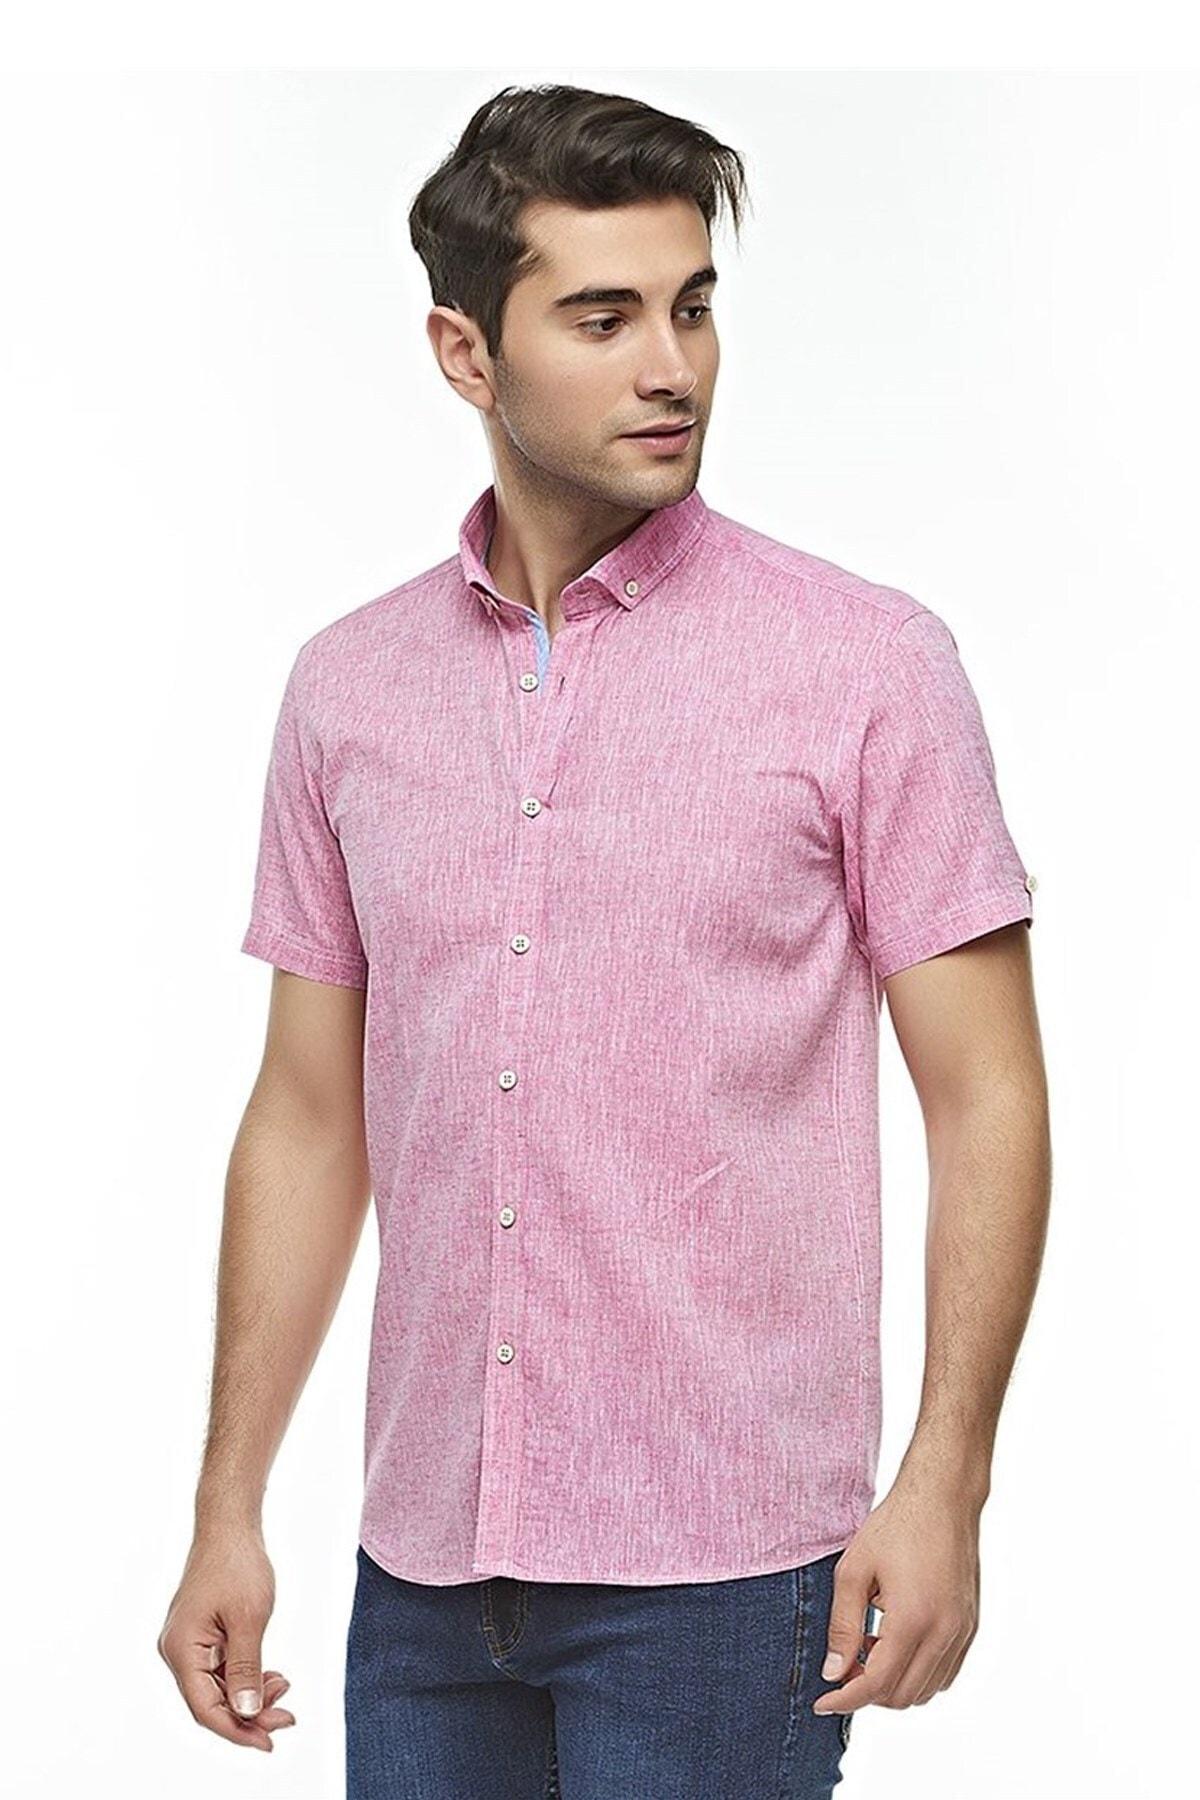 Ottomoda Kısa Kollu Keten Gömlek Pink 1